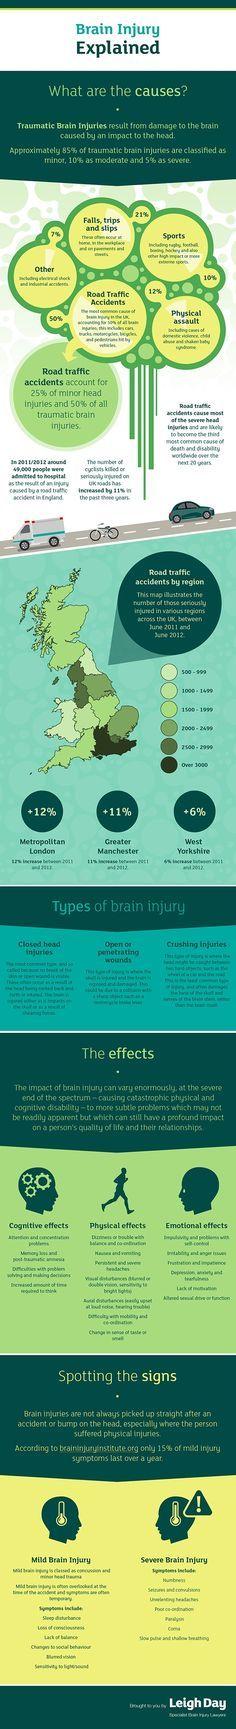 Brain Injury Explained [infographic]